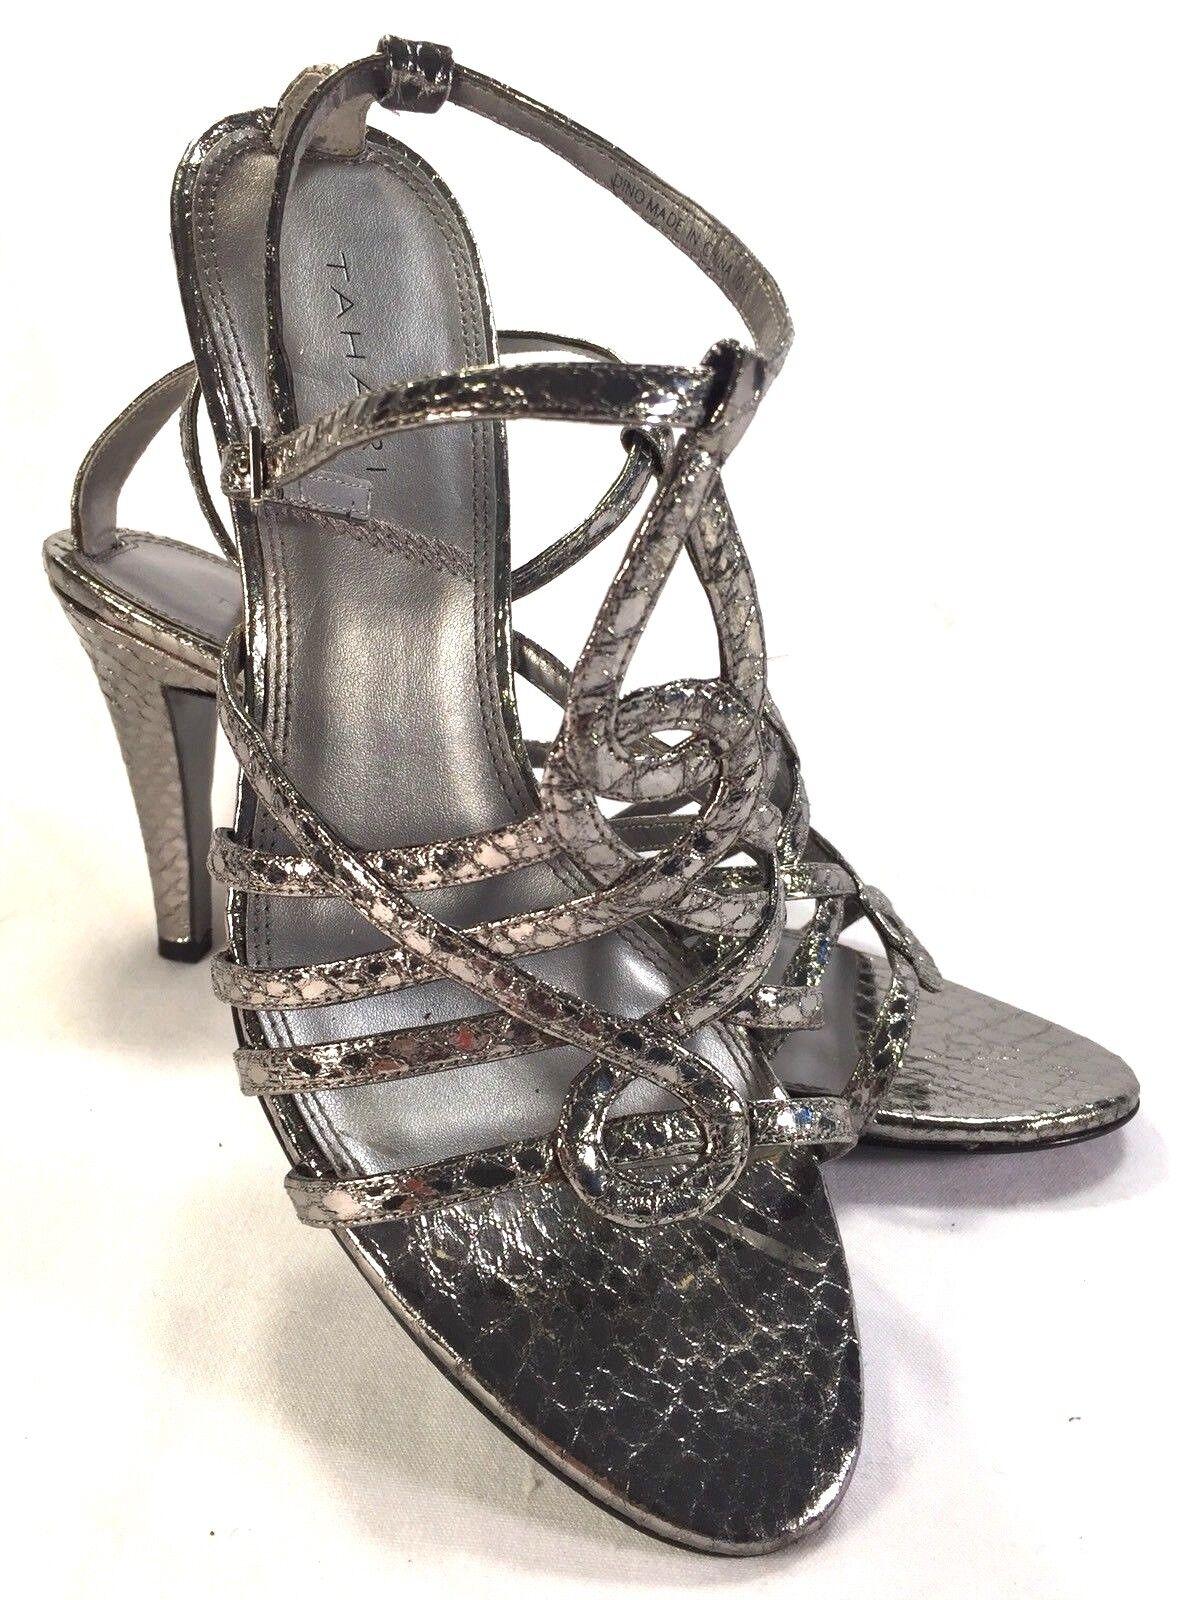 Tahari Silver Metallic Snakeskin Pattern Strappy Peep Toe Sandal Pumps 10M shoes